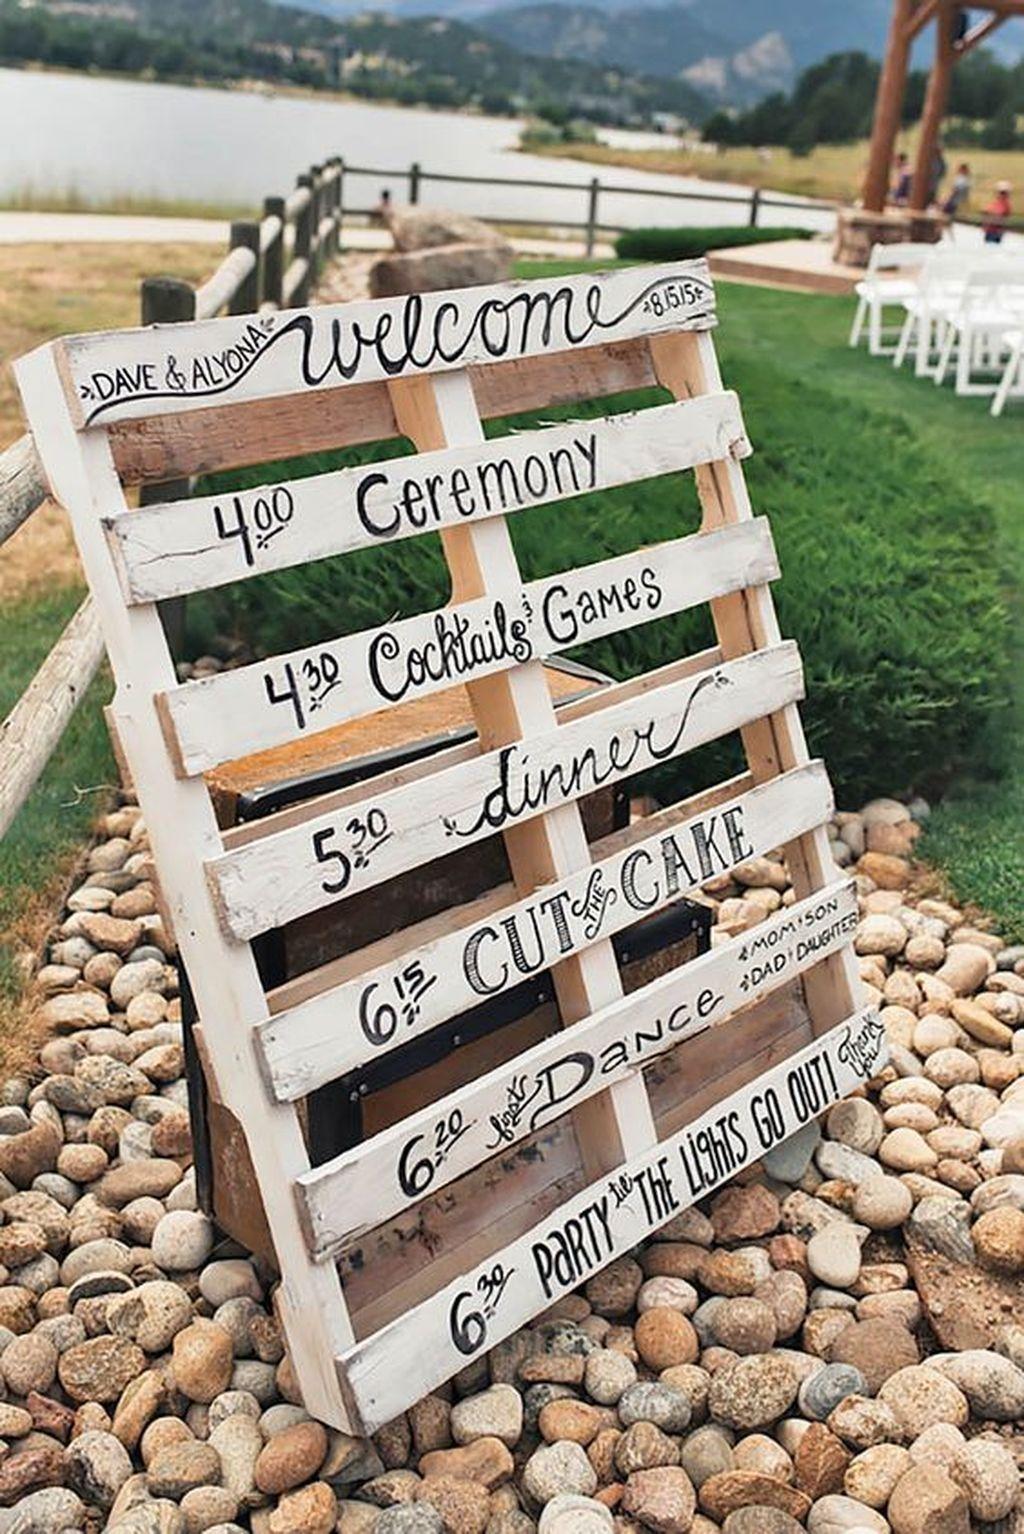 Awesome 86 elegant rustic wedding decoration ideas 2017 http awesome 86 elegant rustic wedding decoration ideas 2017 httplovellywedding junglespirit Images